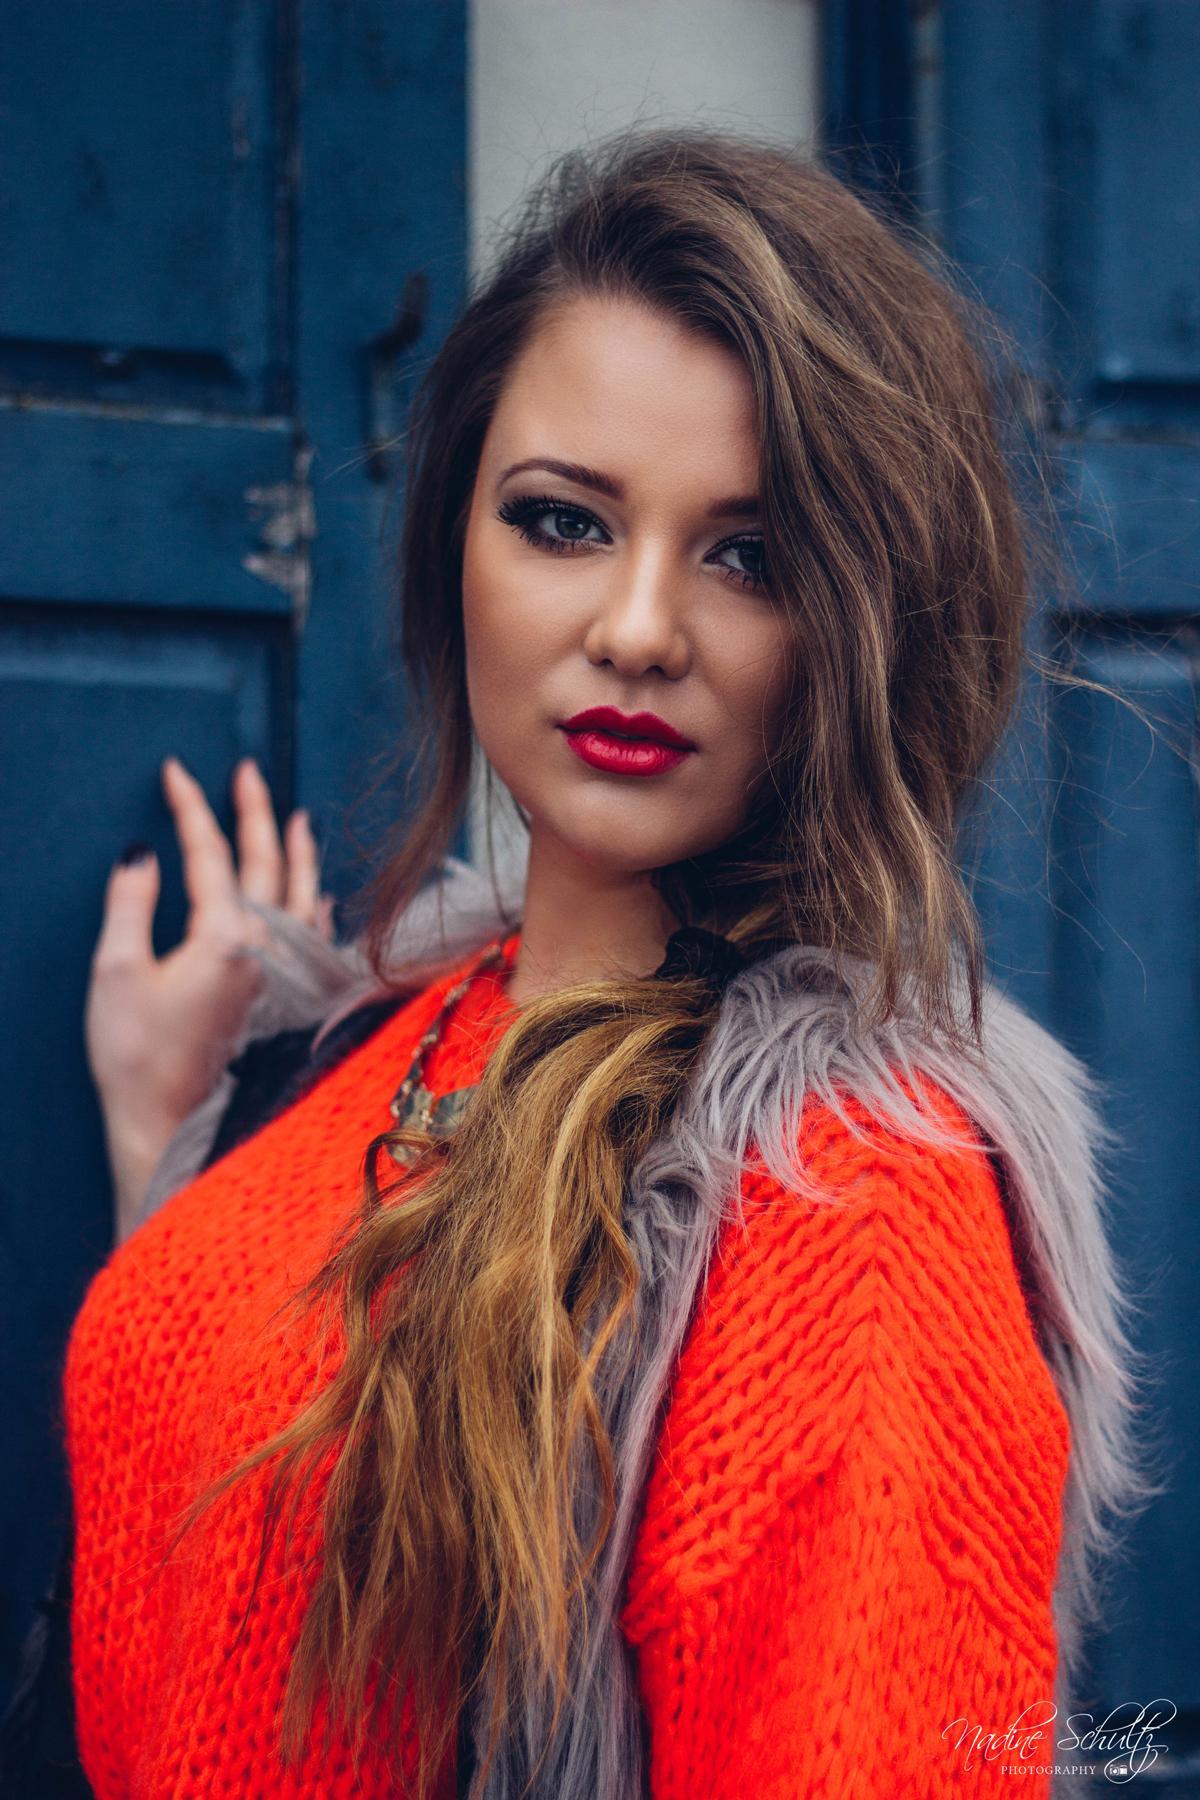 Celebrities Nadine Schultz Photography